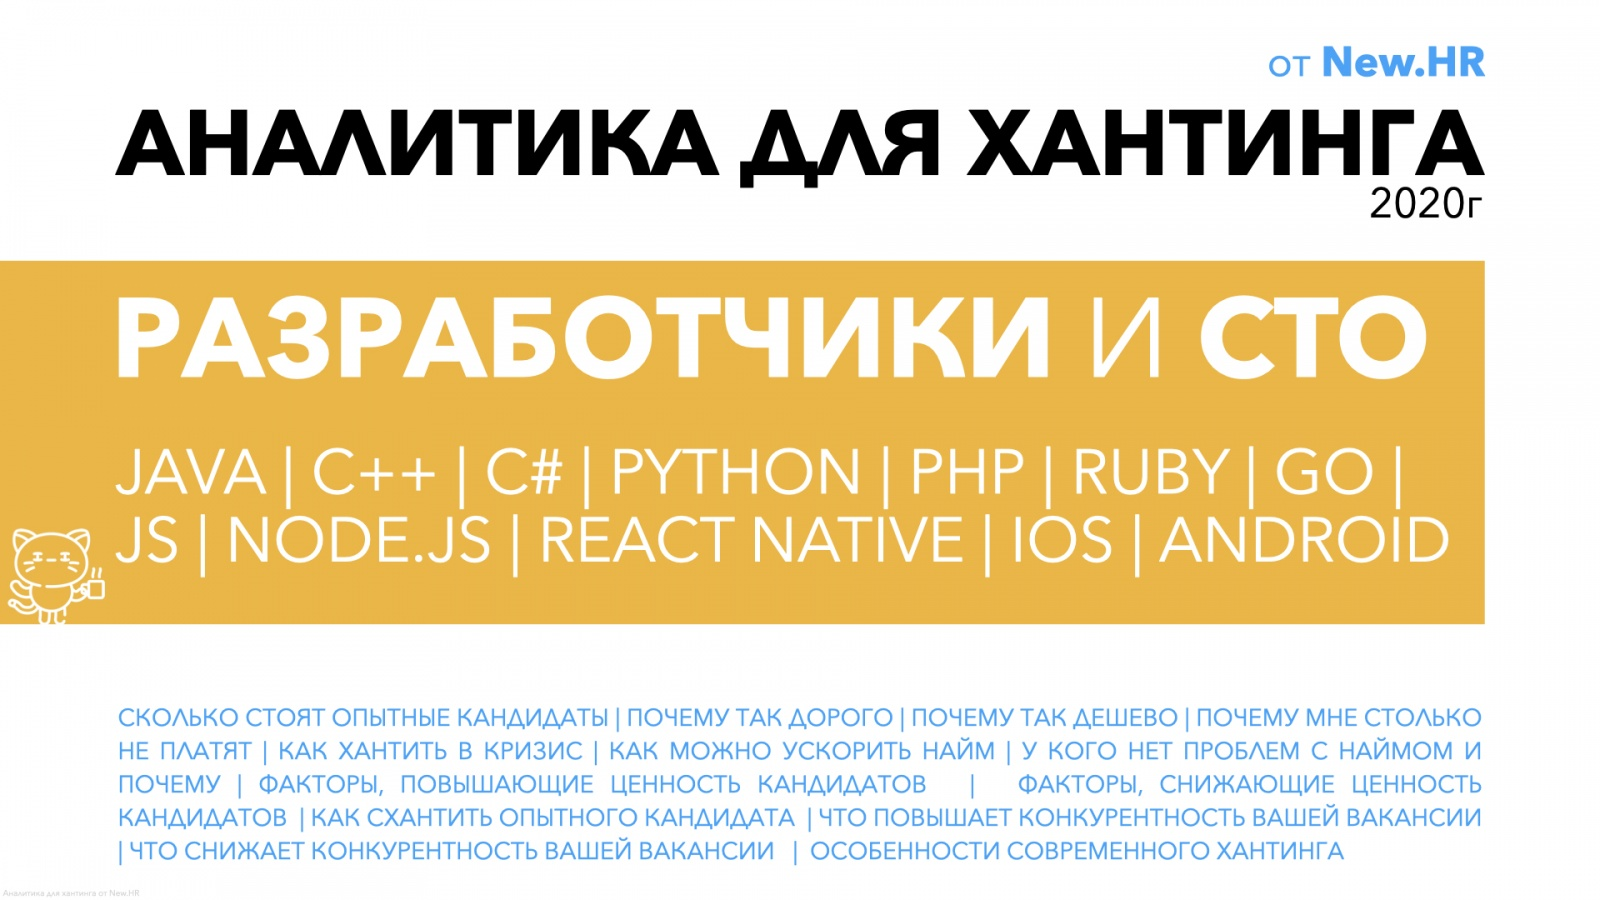 Аналитика для хантинга разработчиков и CTO - 1